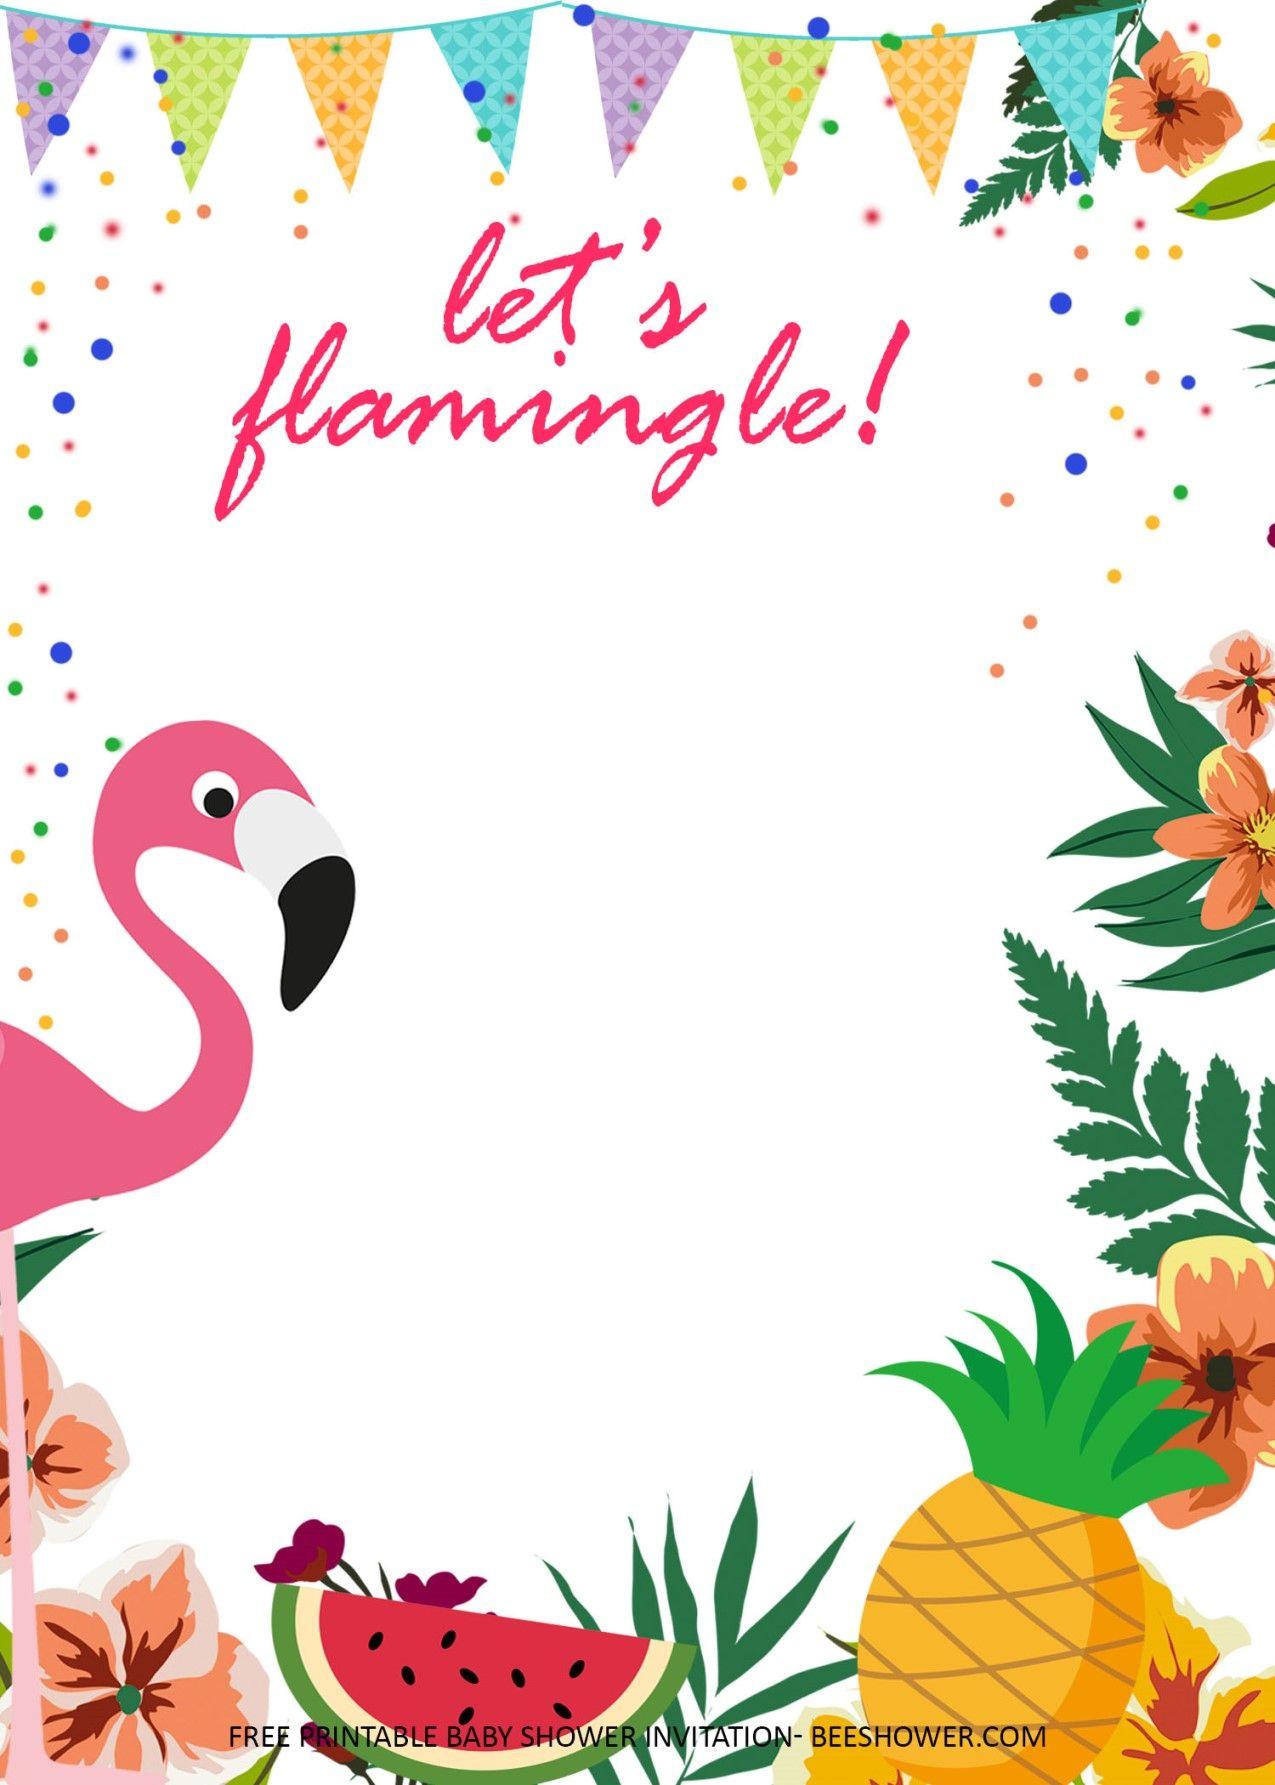 Free Printable Flamingo Invitation Templates Flamingo Invitation Flamingo Birthday Party Invitations Free Printable Baby Shower Invitations